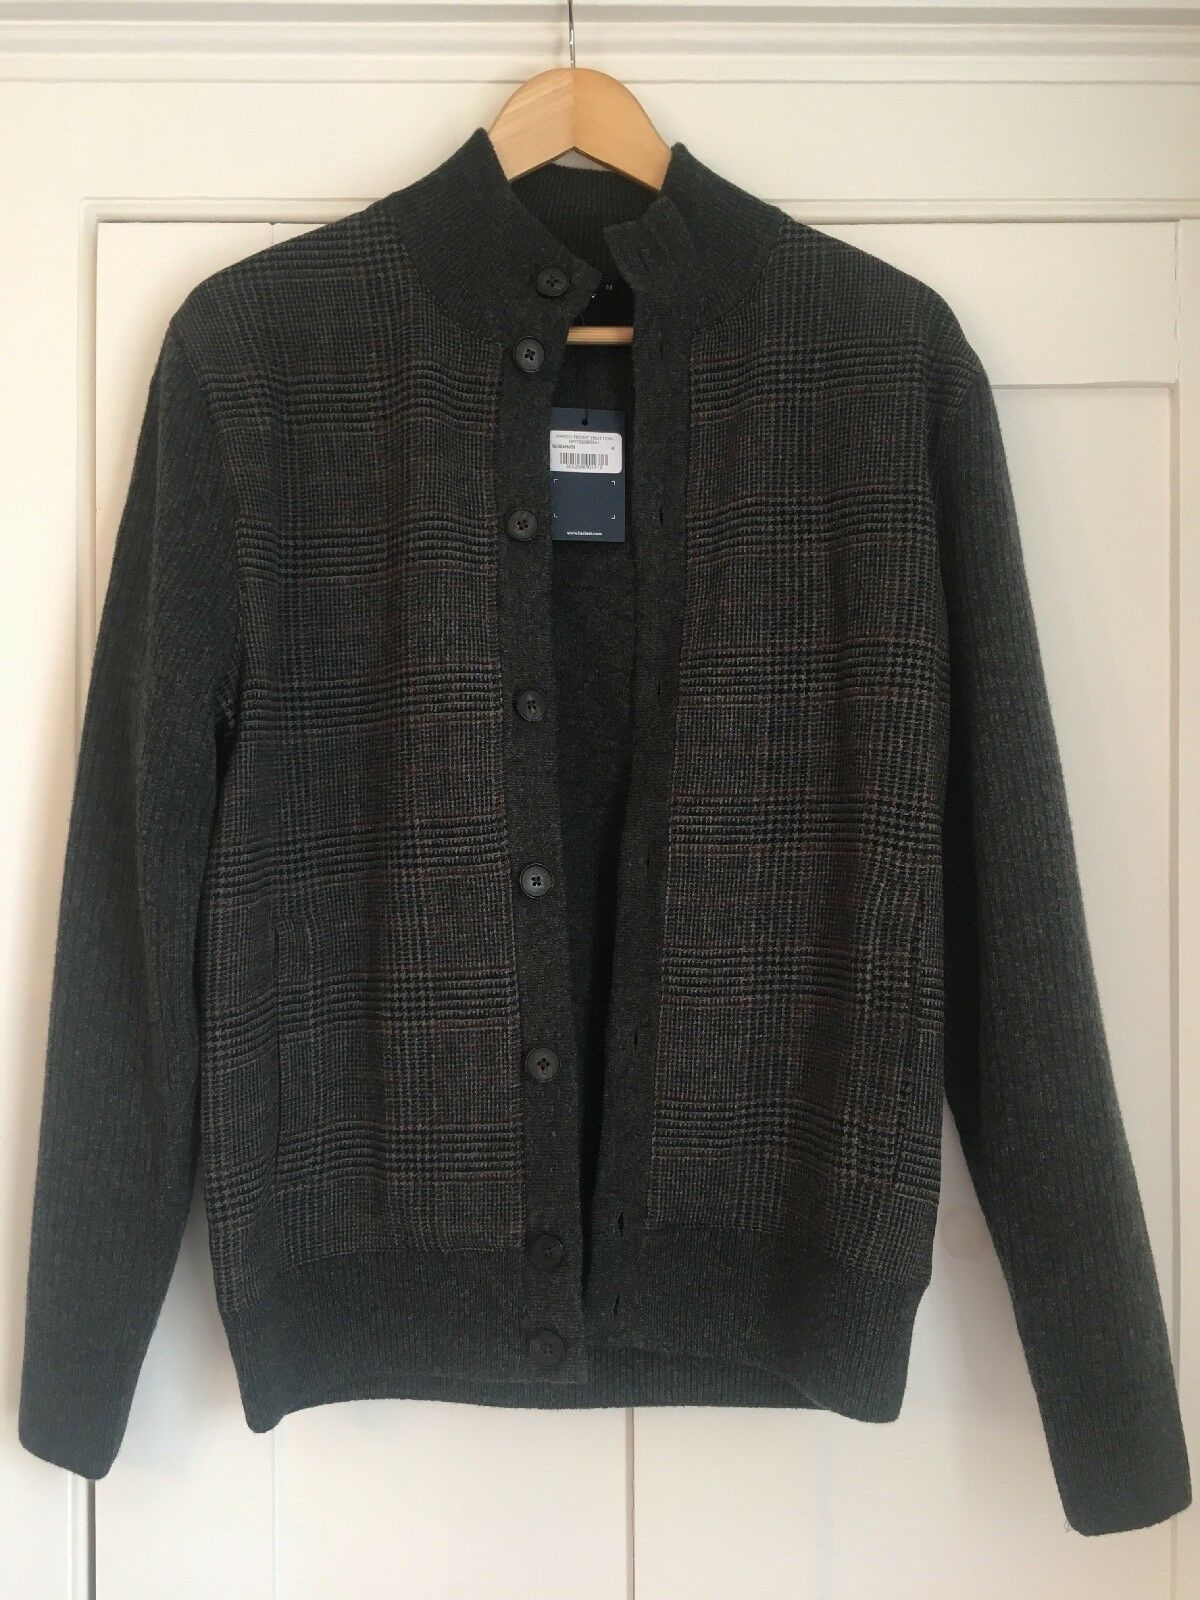 Hackett London Tweed From Button Cardigan, grau, Medium